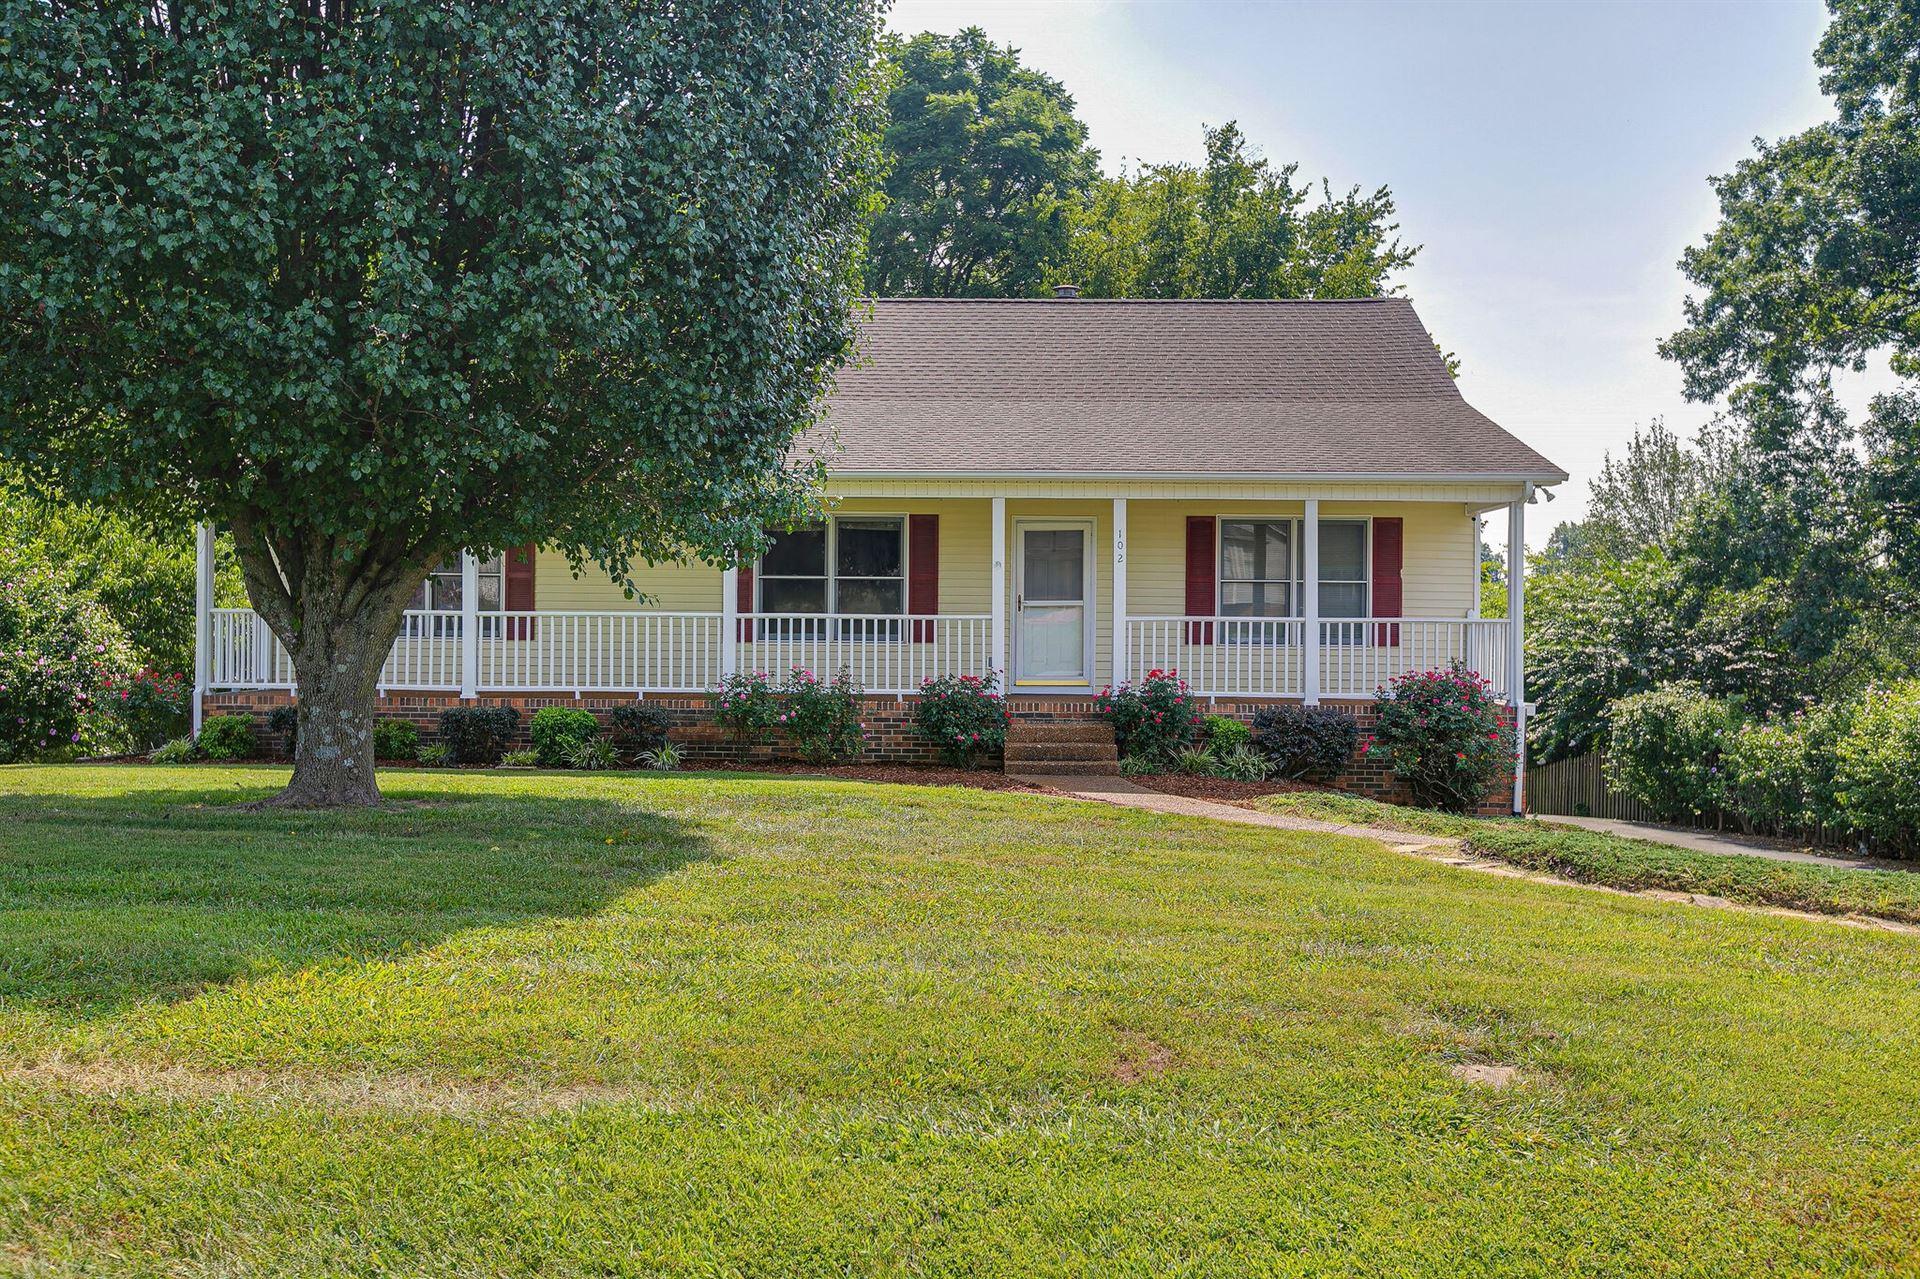 102 Dale Court, Columbia, TN 38401 - MLS#: 2278298